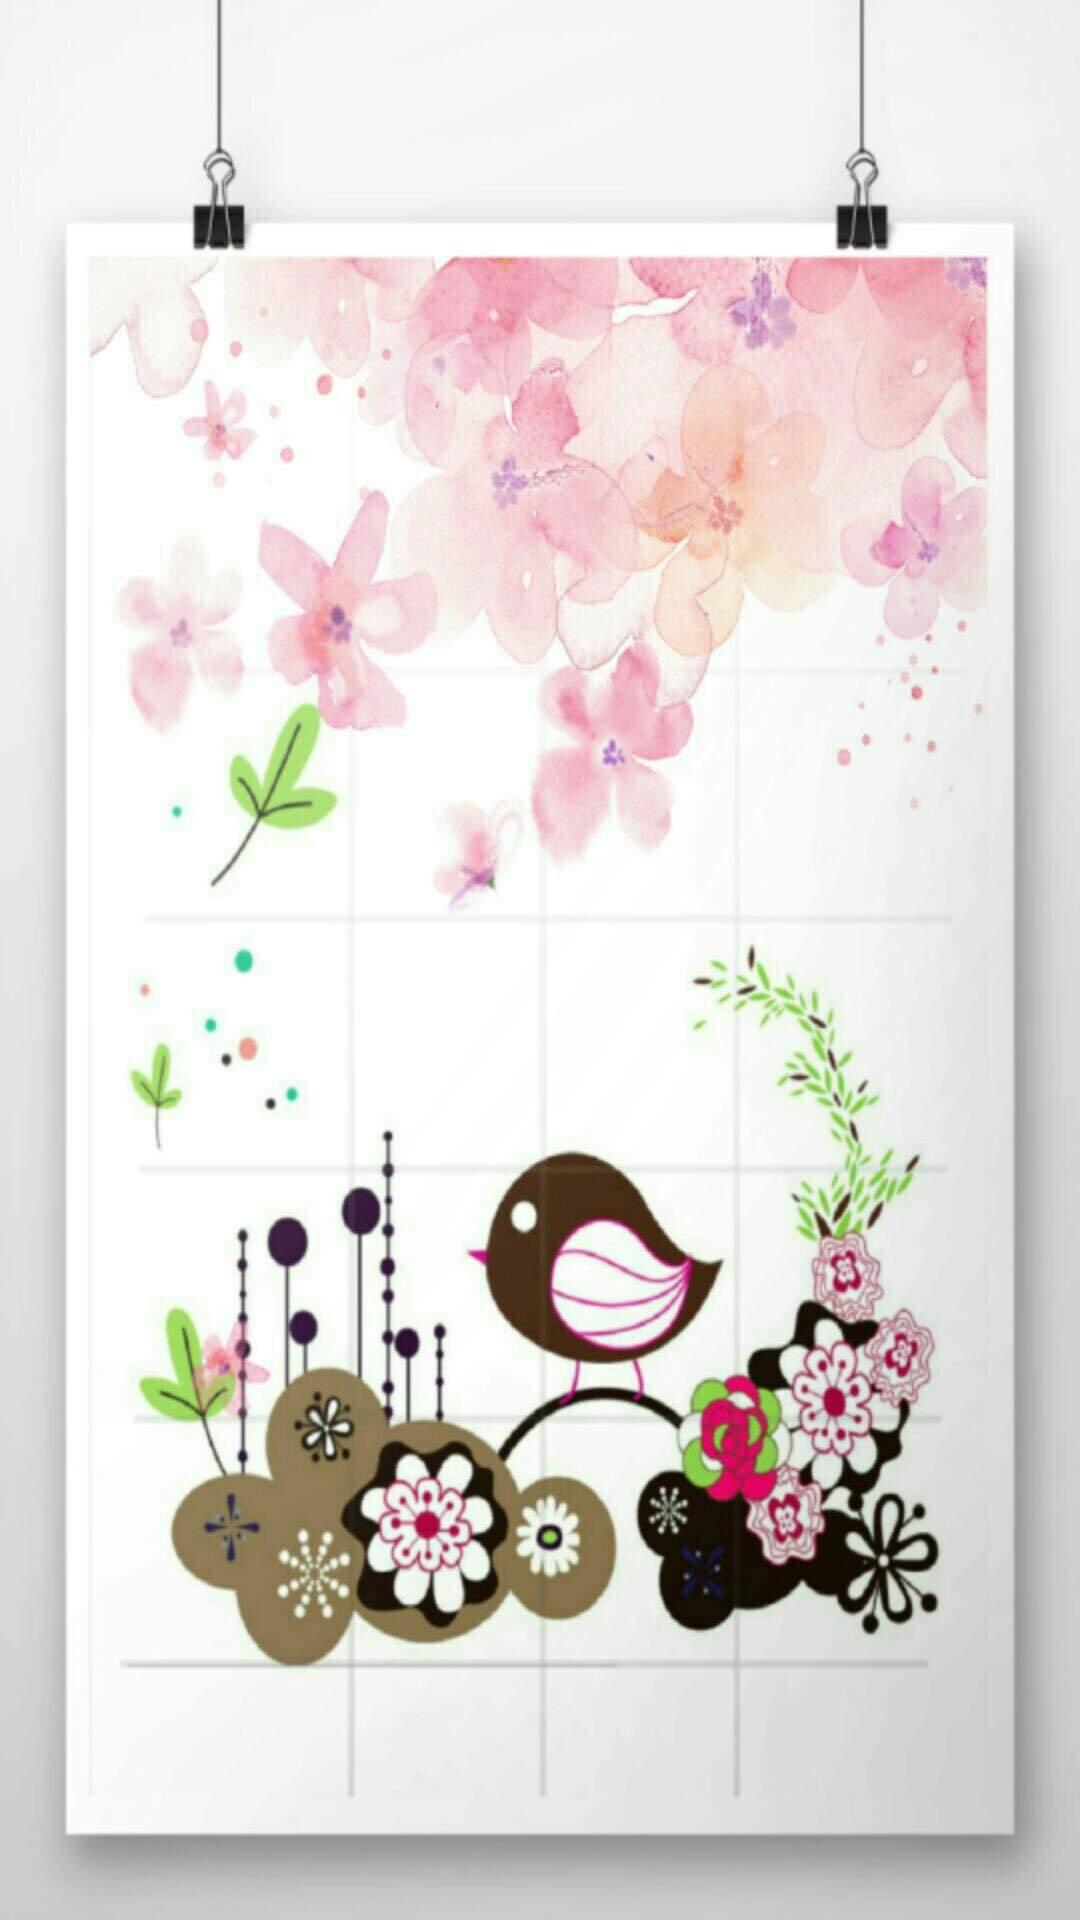 Unduh 60 Wallpaper Bunga Jpg HD Gratid